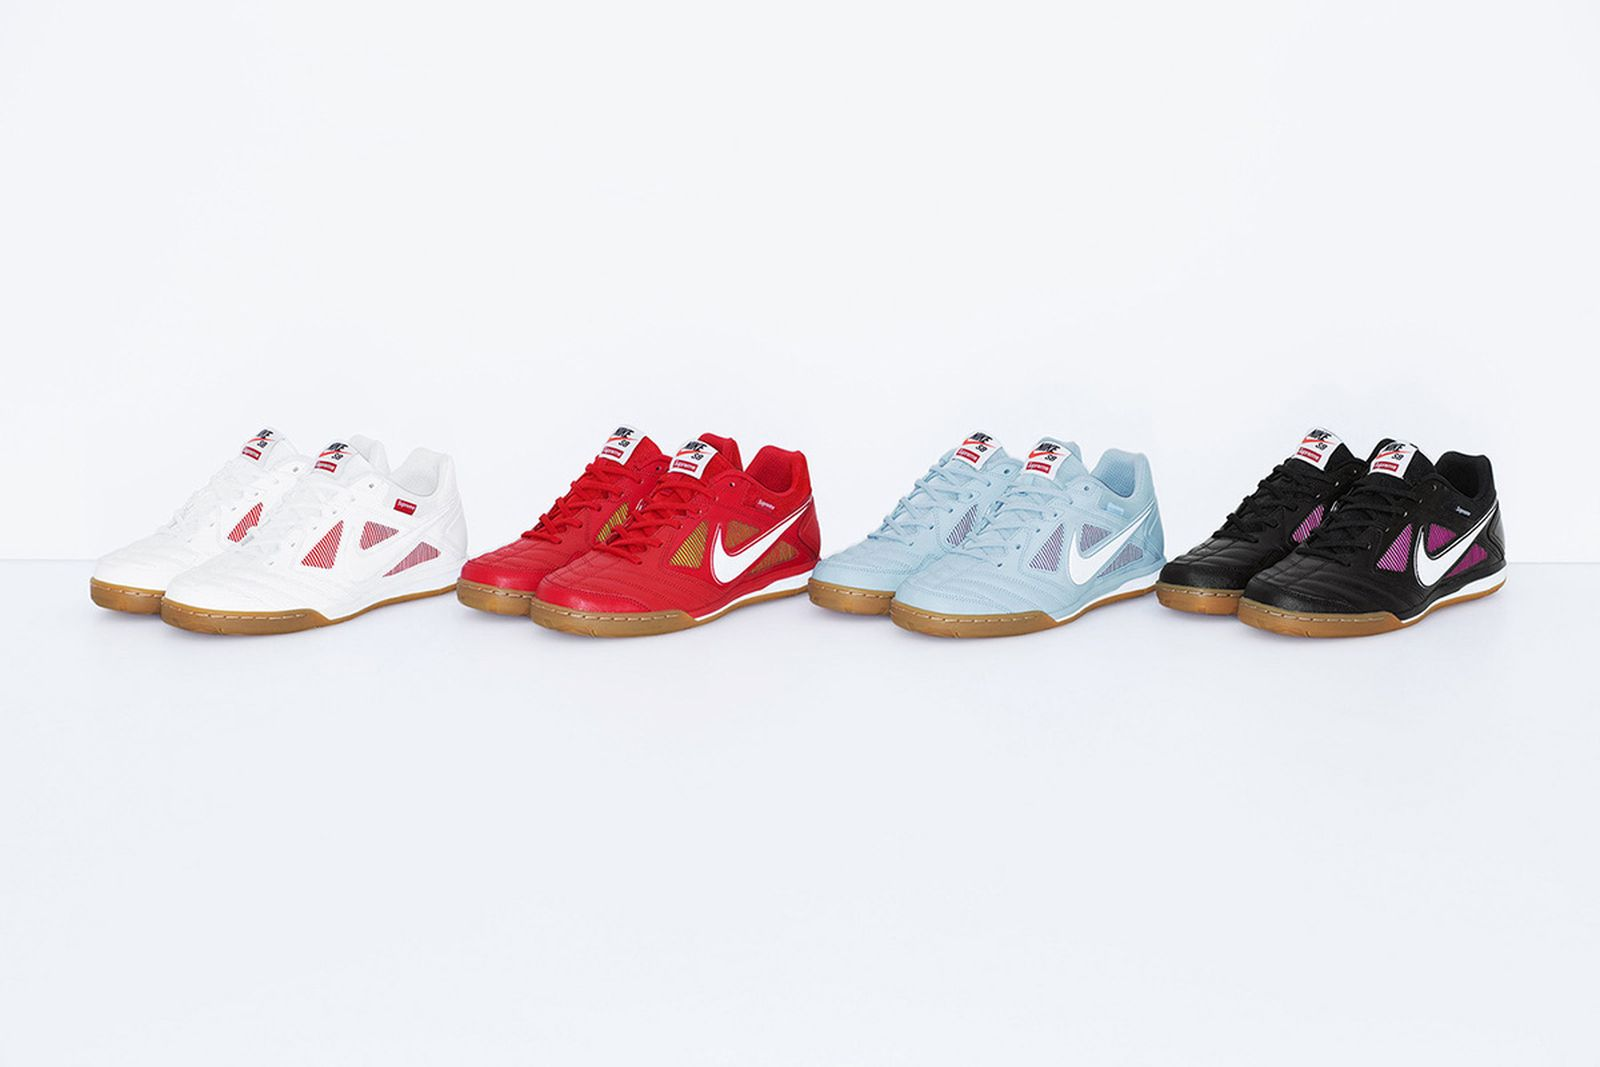 Supreme Nike SB Gato comme des garcons